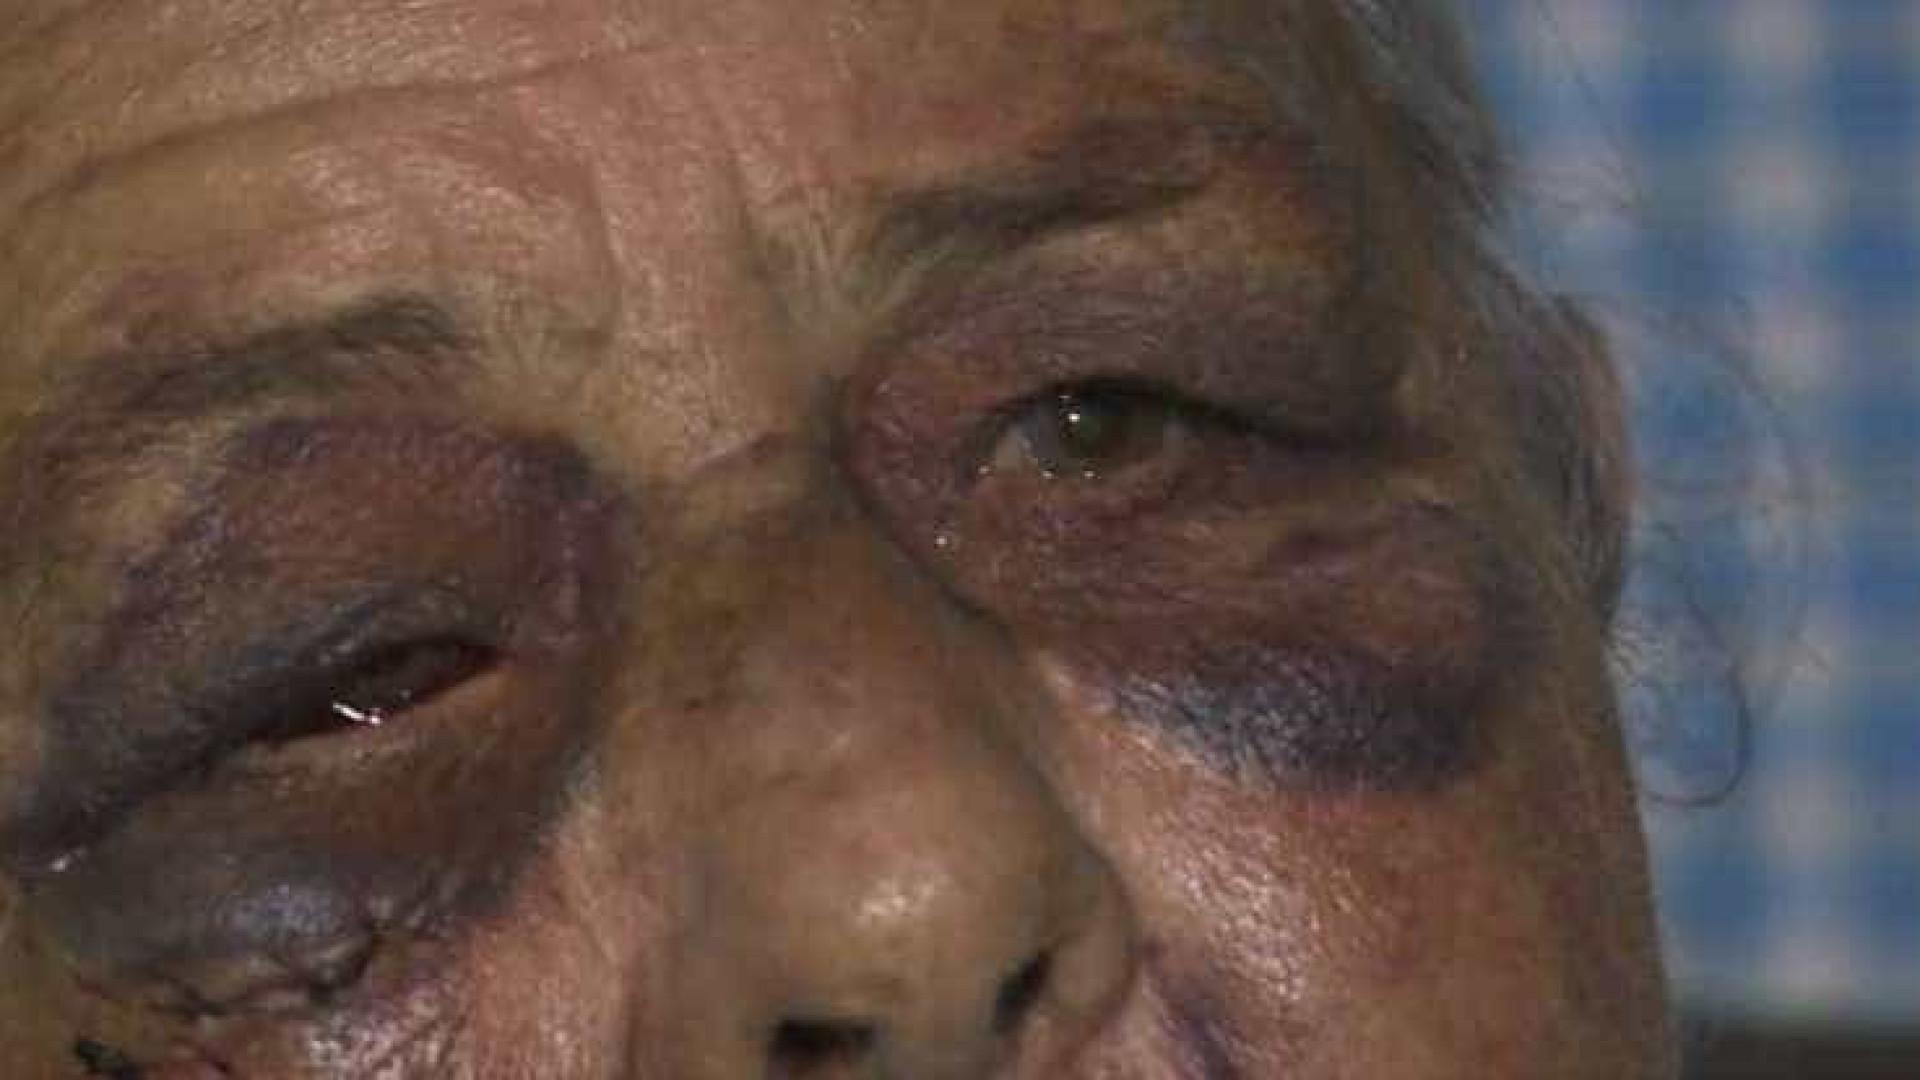 Cuidador é suspeito de estuprar  e espancar idosa de 75 anos